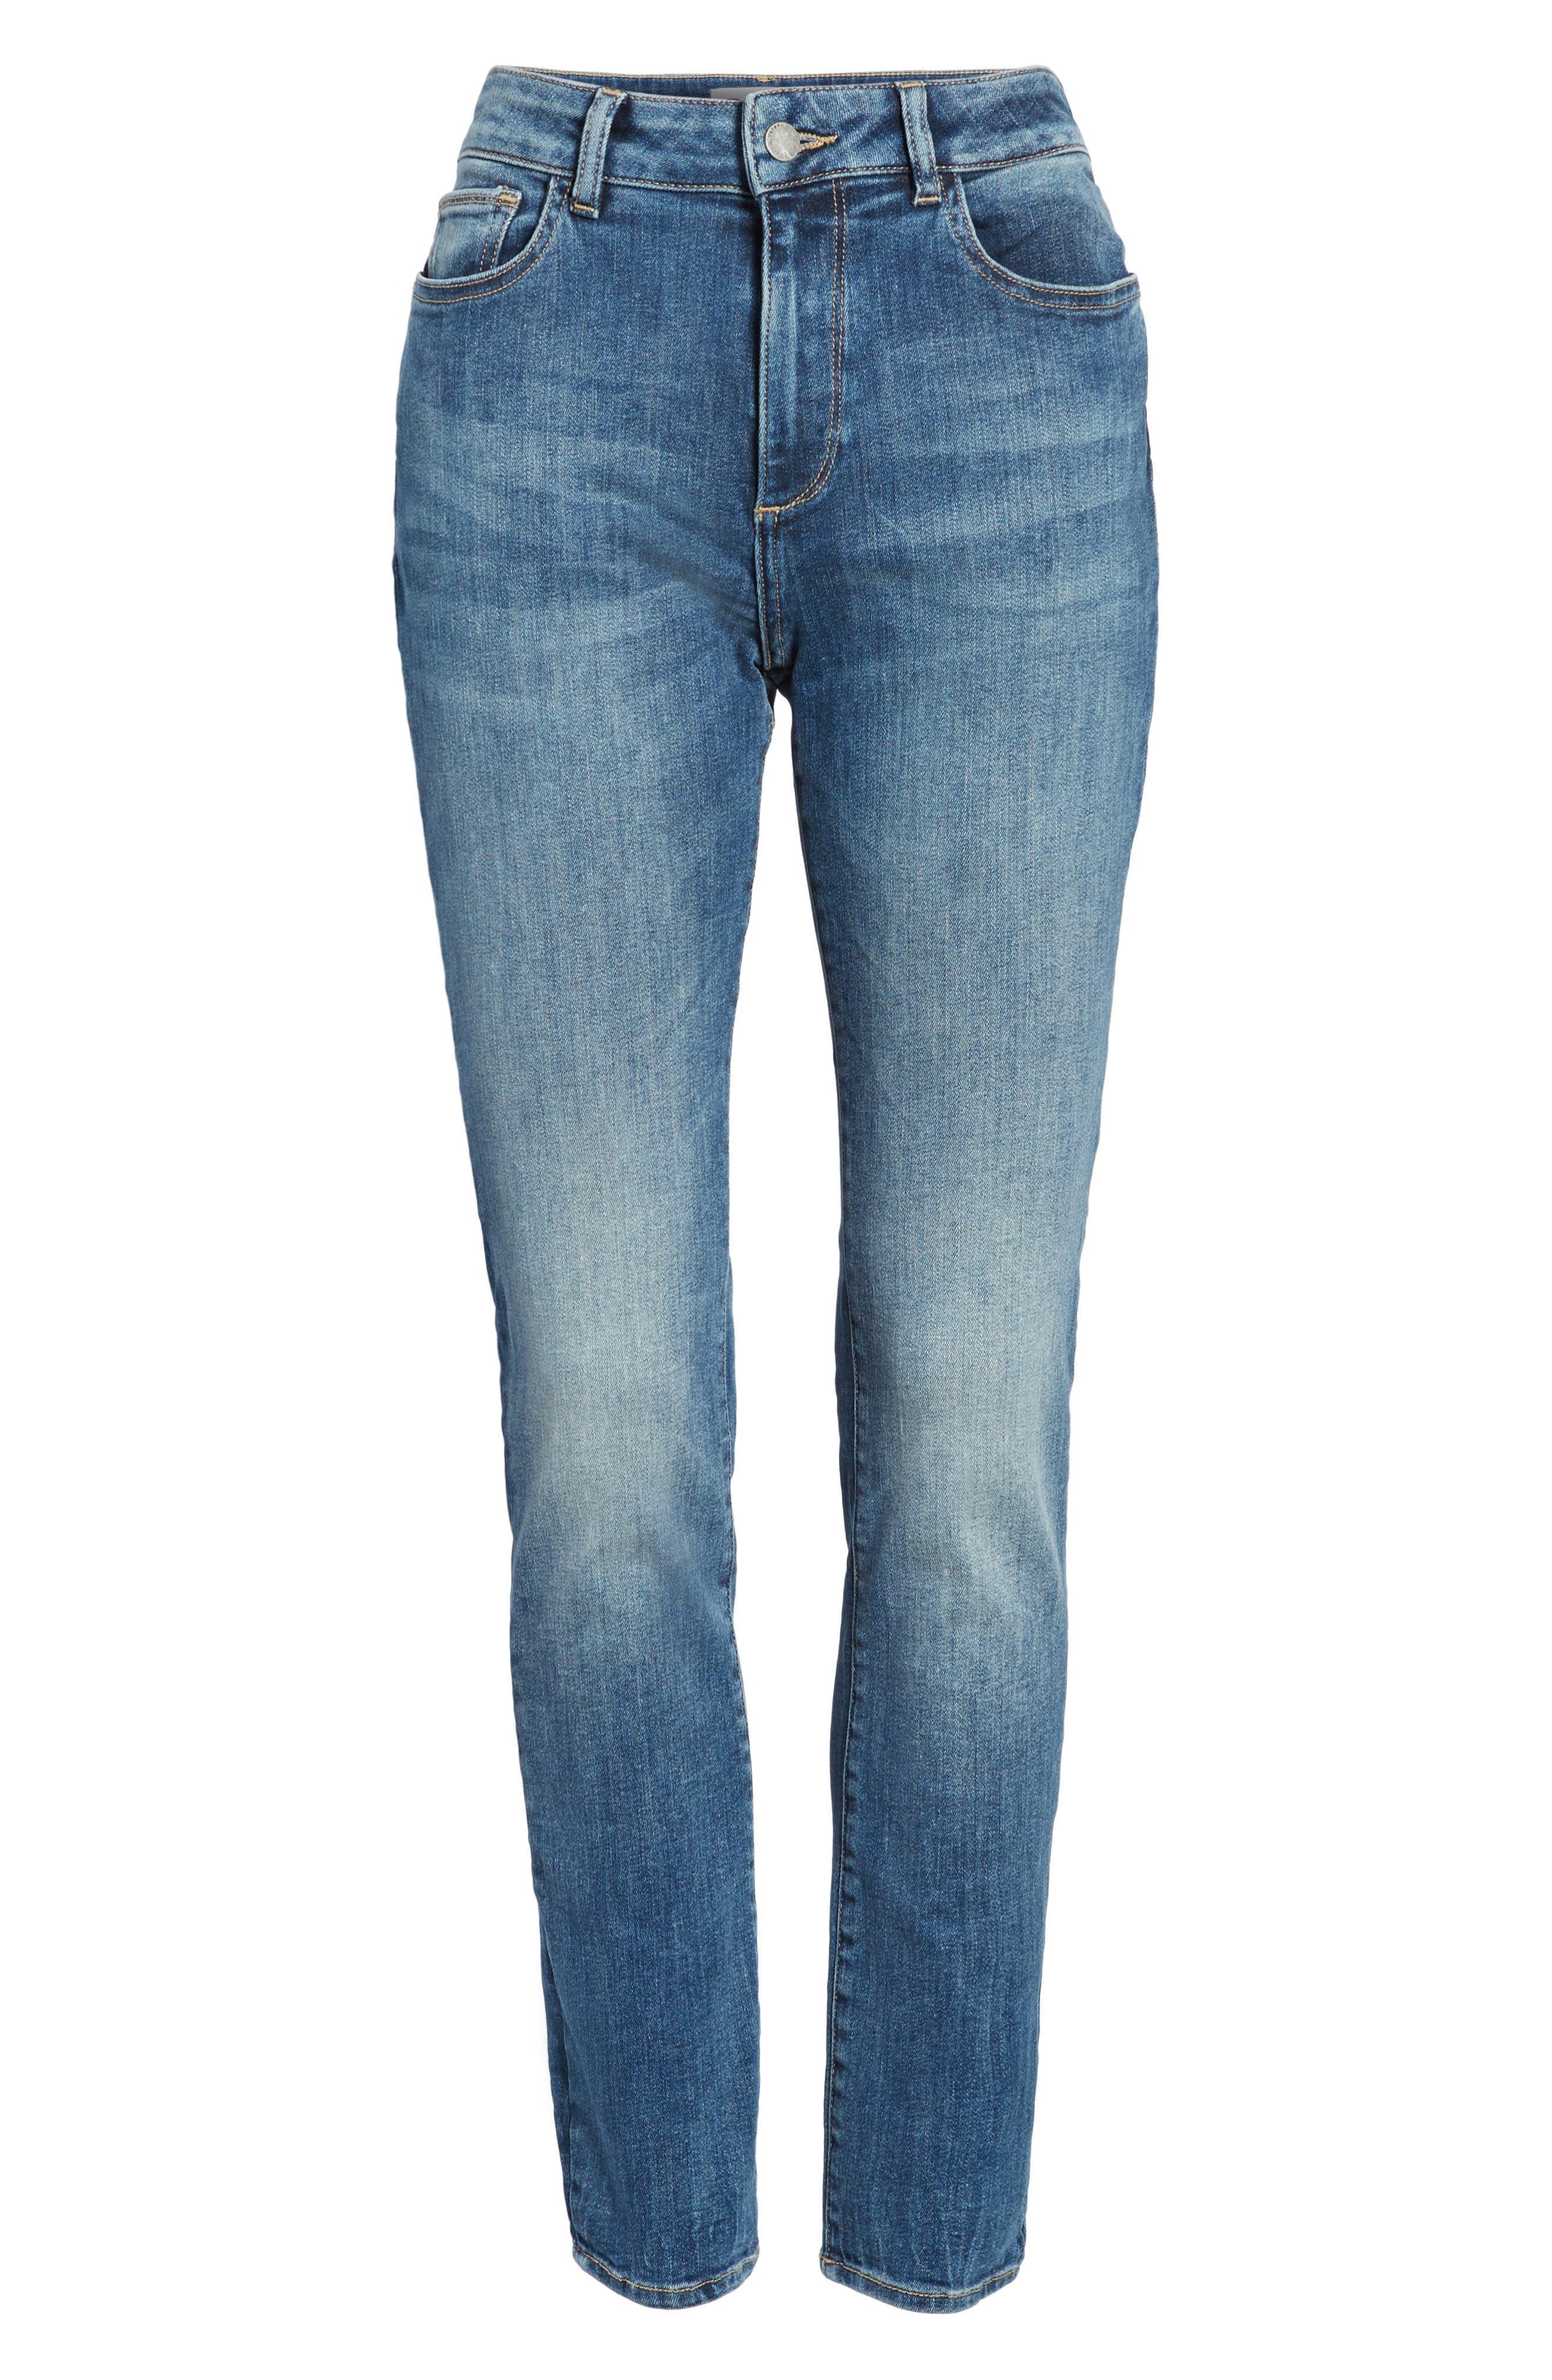 Farrow Instaslim High Waist Skinny Jeans,                             Alternate thumbnail 6, color,                             Wells